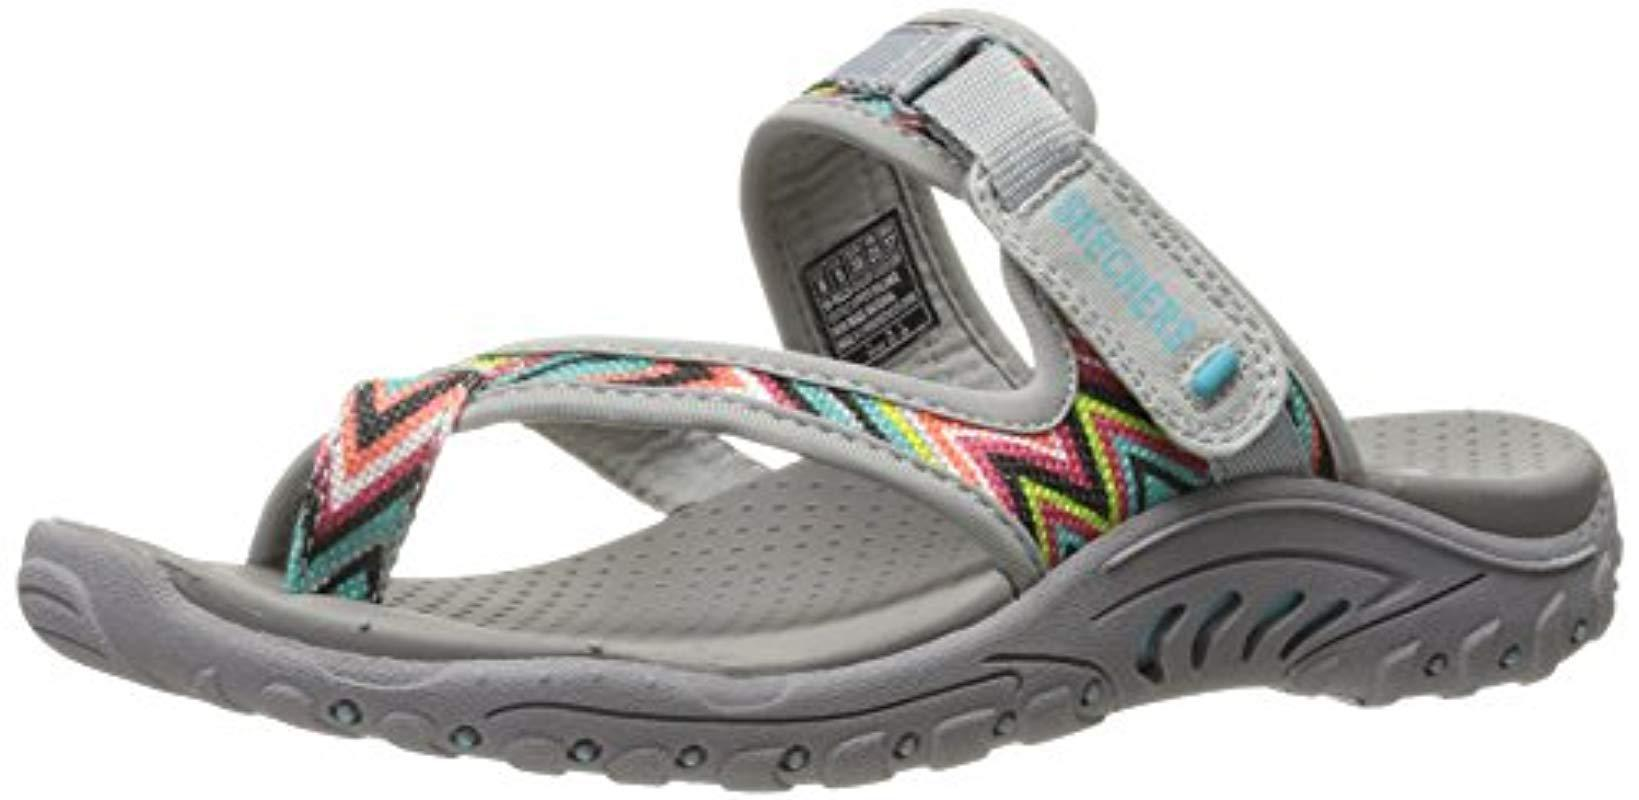 e90c6bcbfdb5 Lyst - Skechers Reggae-Zig Swag Flip-flop Sandals in Gray - Save ...